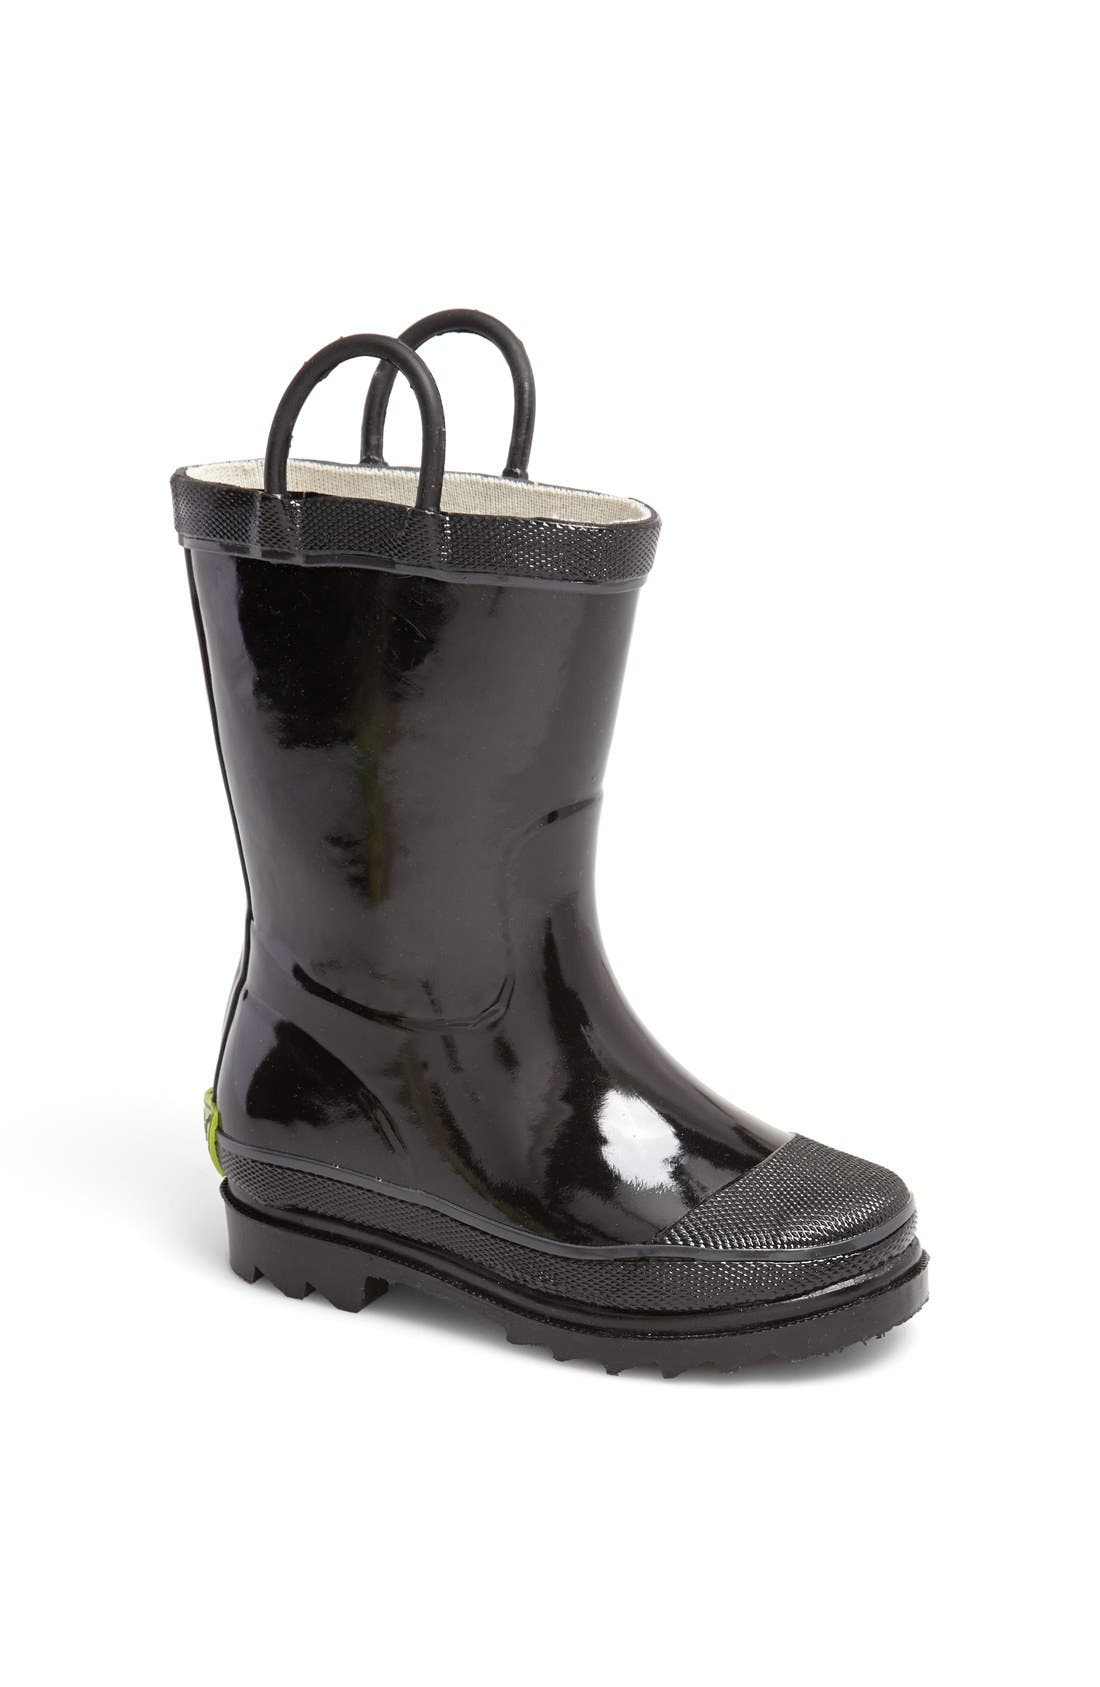 Western Chief 'Firechief 2' Rain Boot  (Walker, Toddler, Little Kid & Big Kid)